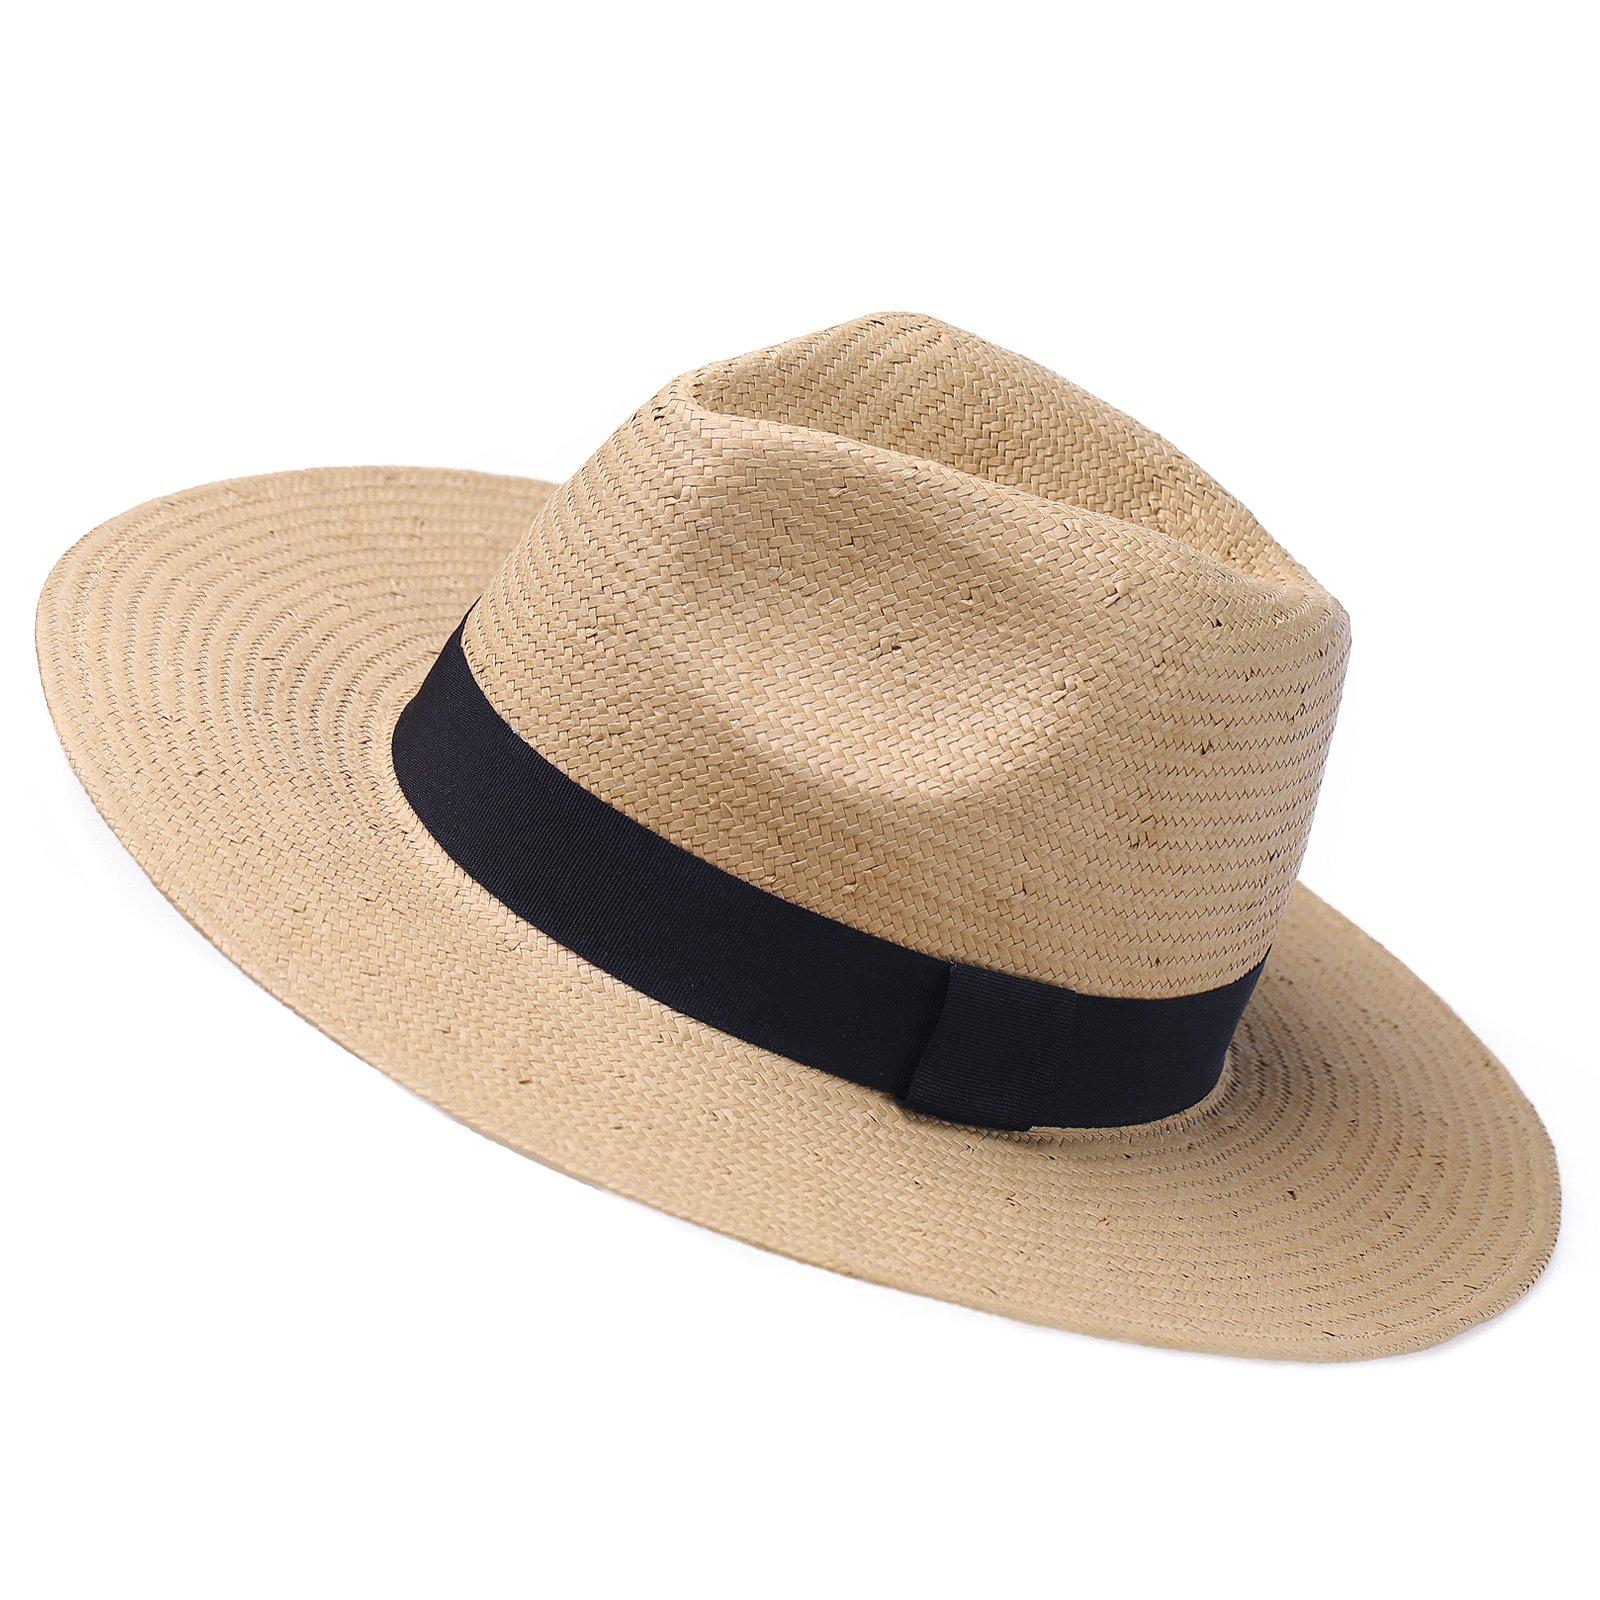 Janey&Rubbnis Summer Handmade Wide Brim Classic Fedora Natural Straw Panama Sun Hat (Medium (7 1/8~7 1/4) 58cm, Beige)